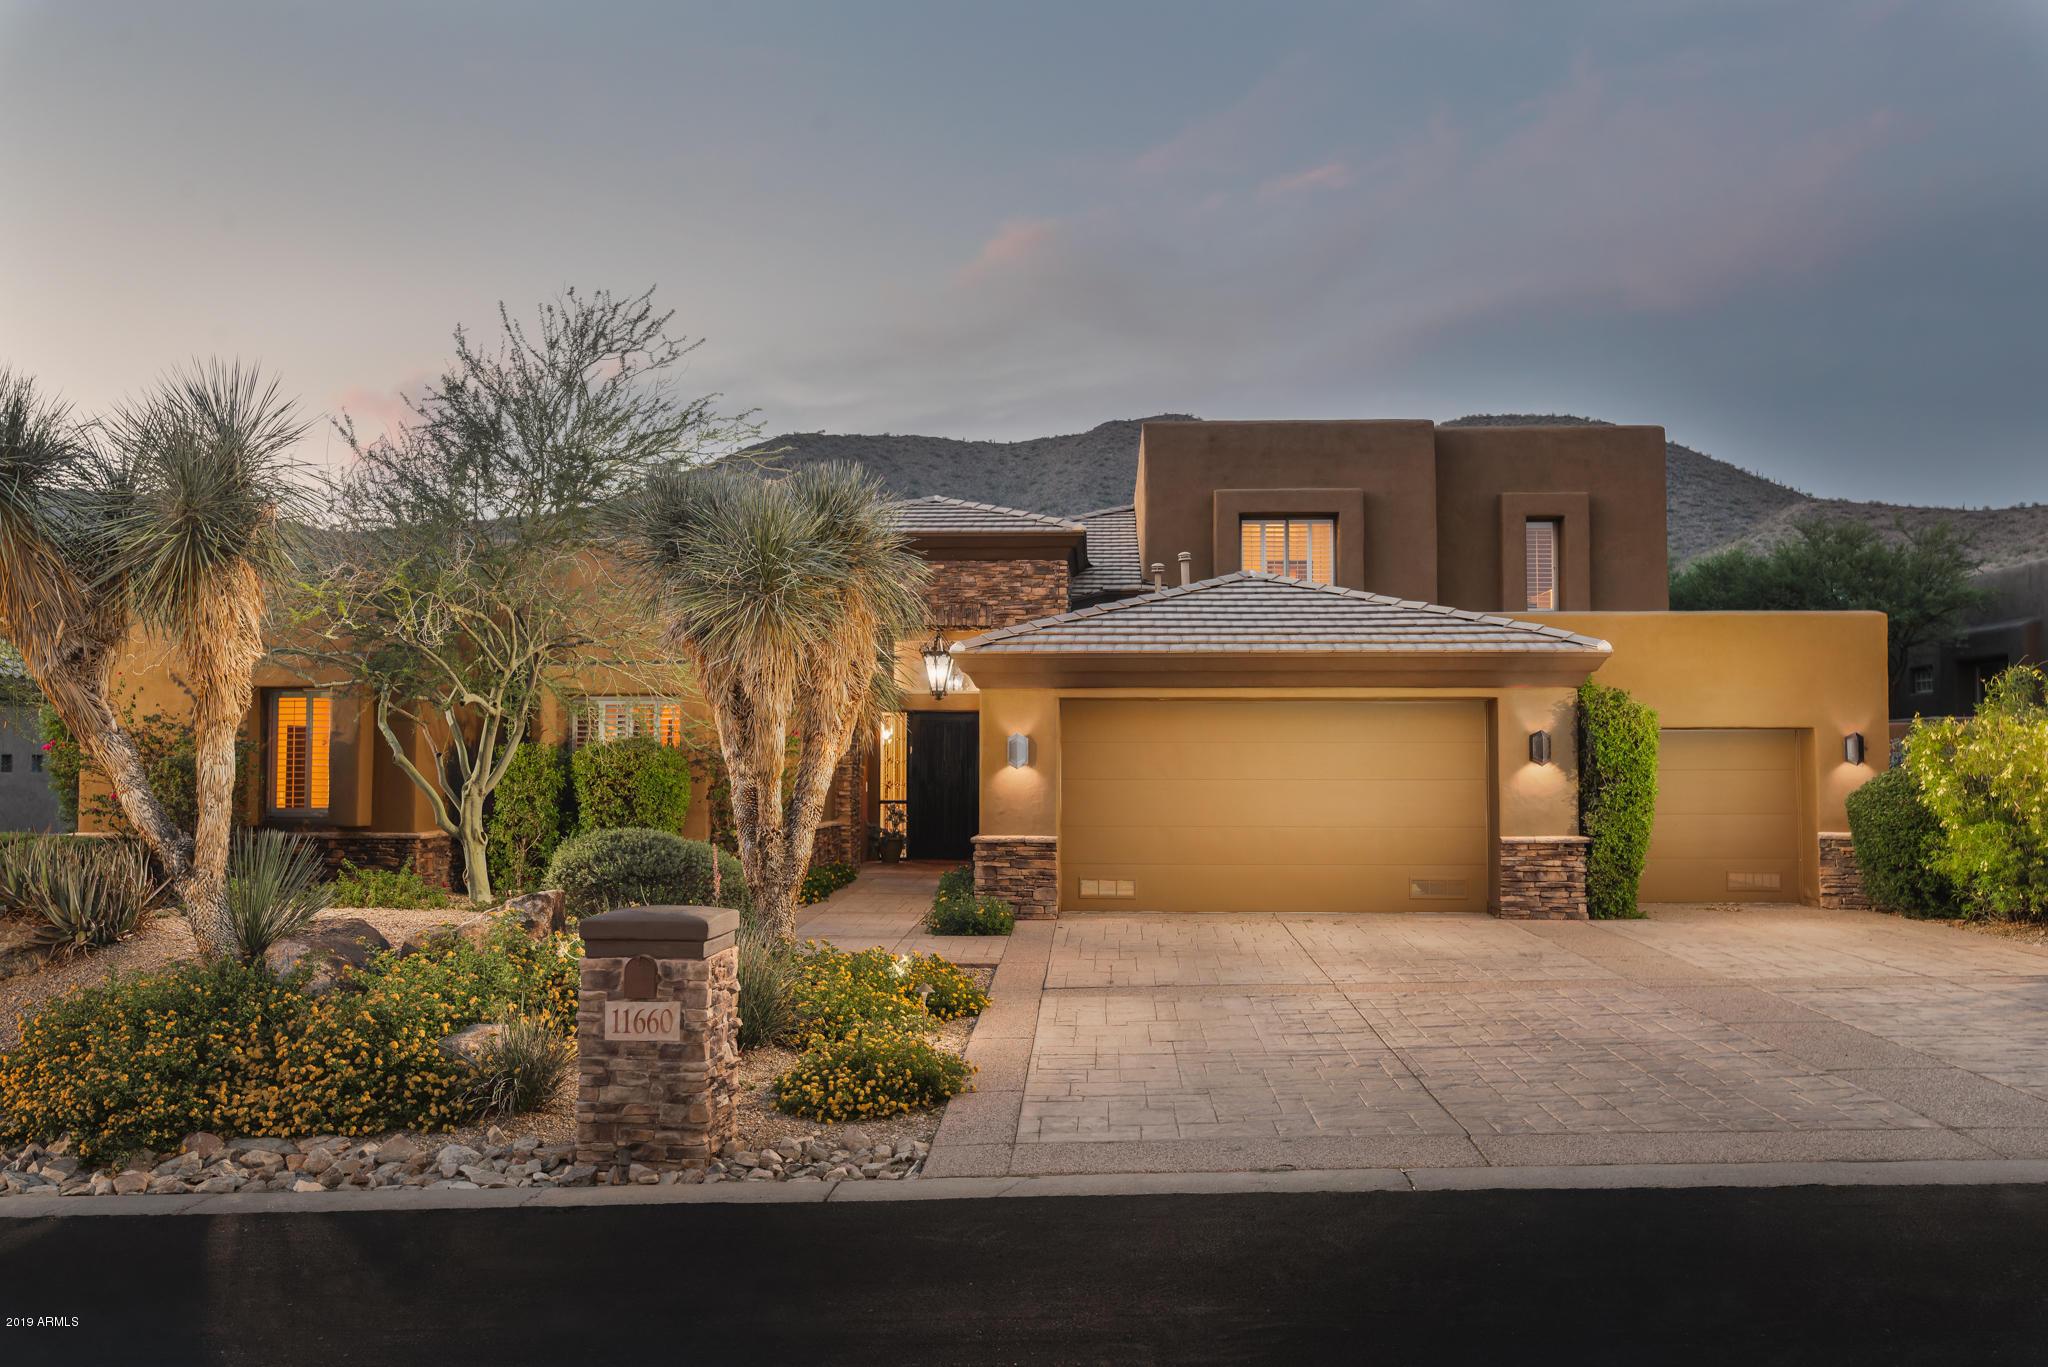 11660 E CHARTER OAK Drive, Scottsdale AZ 85259